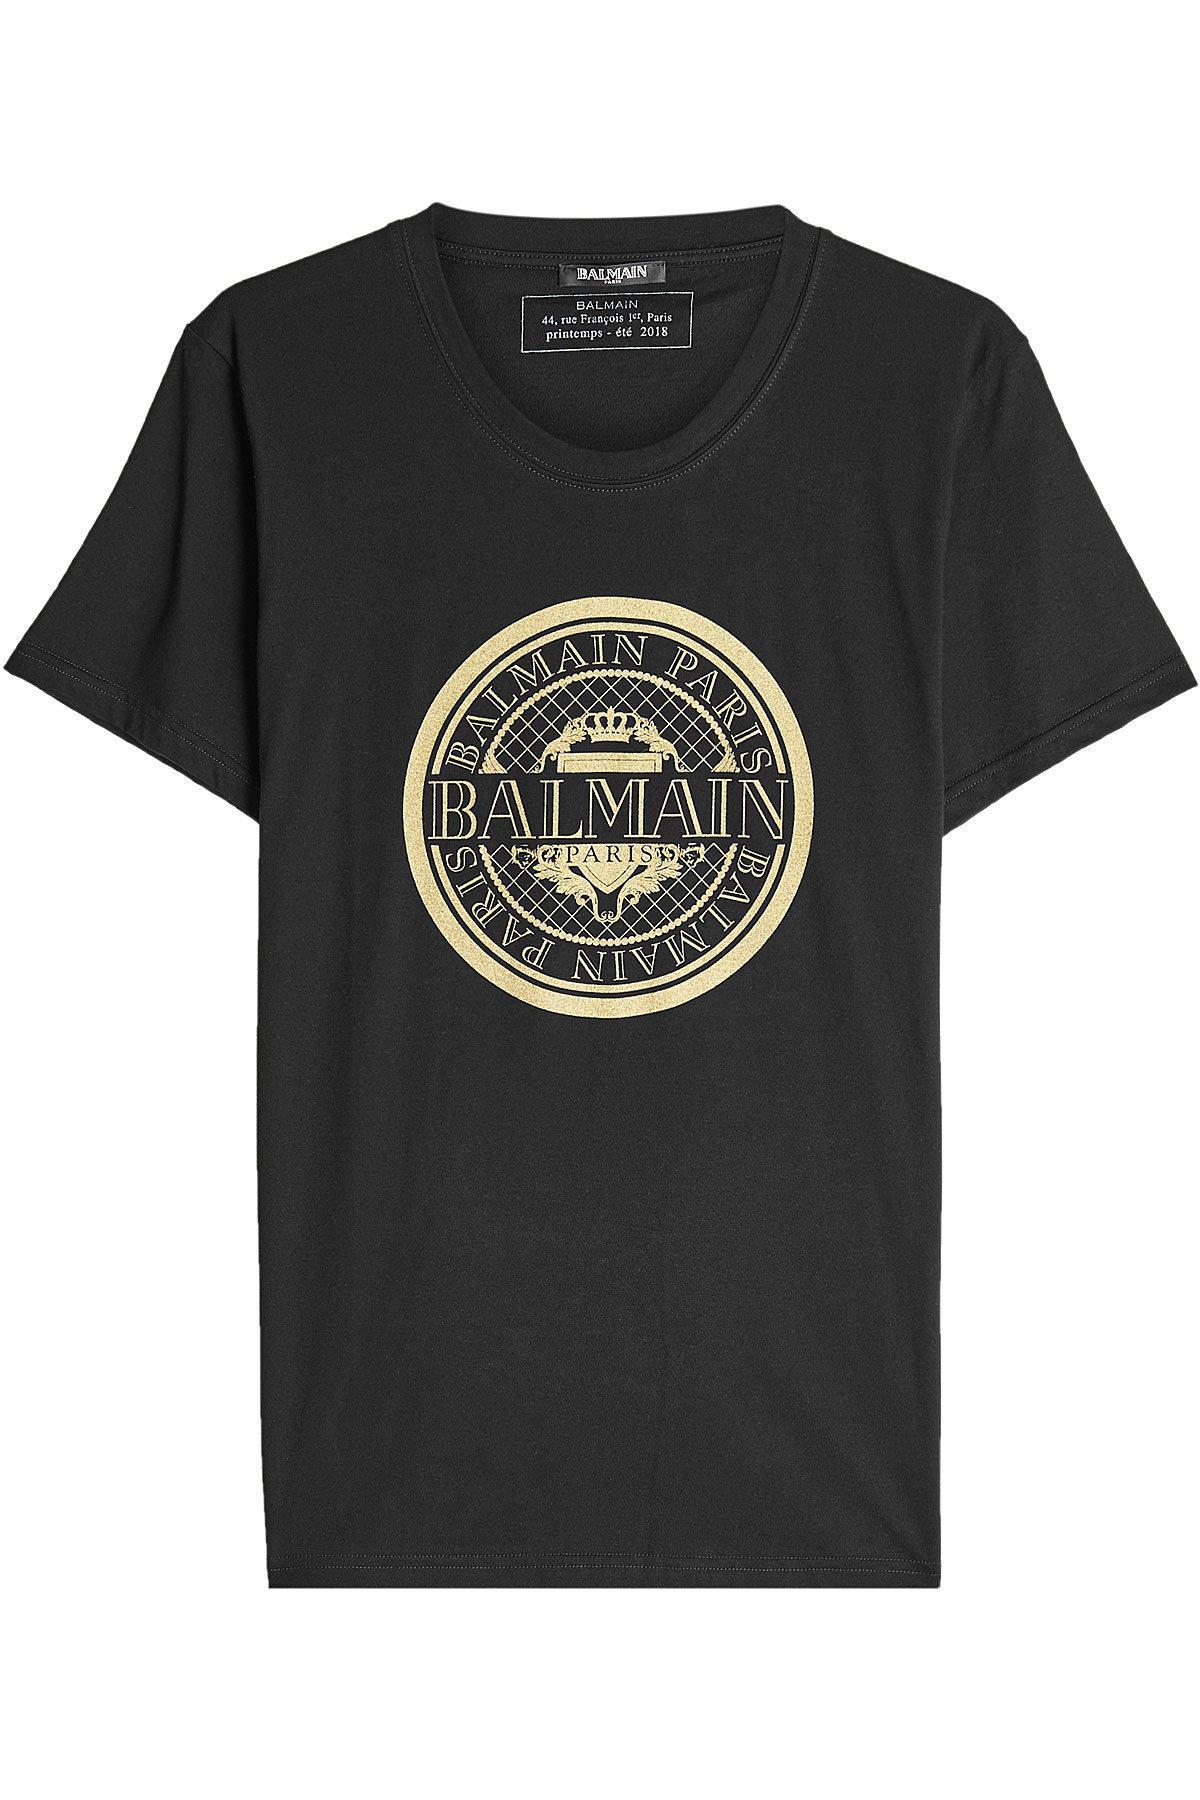 Lyst Balmain Printed Cotton T Shirt In Black For Men